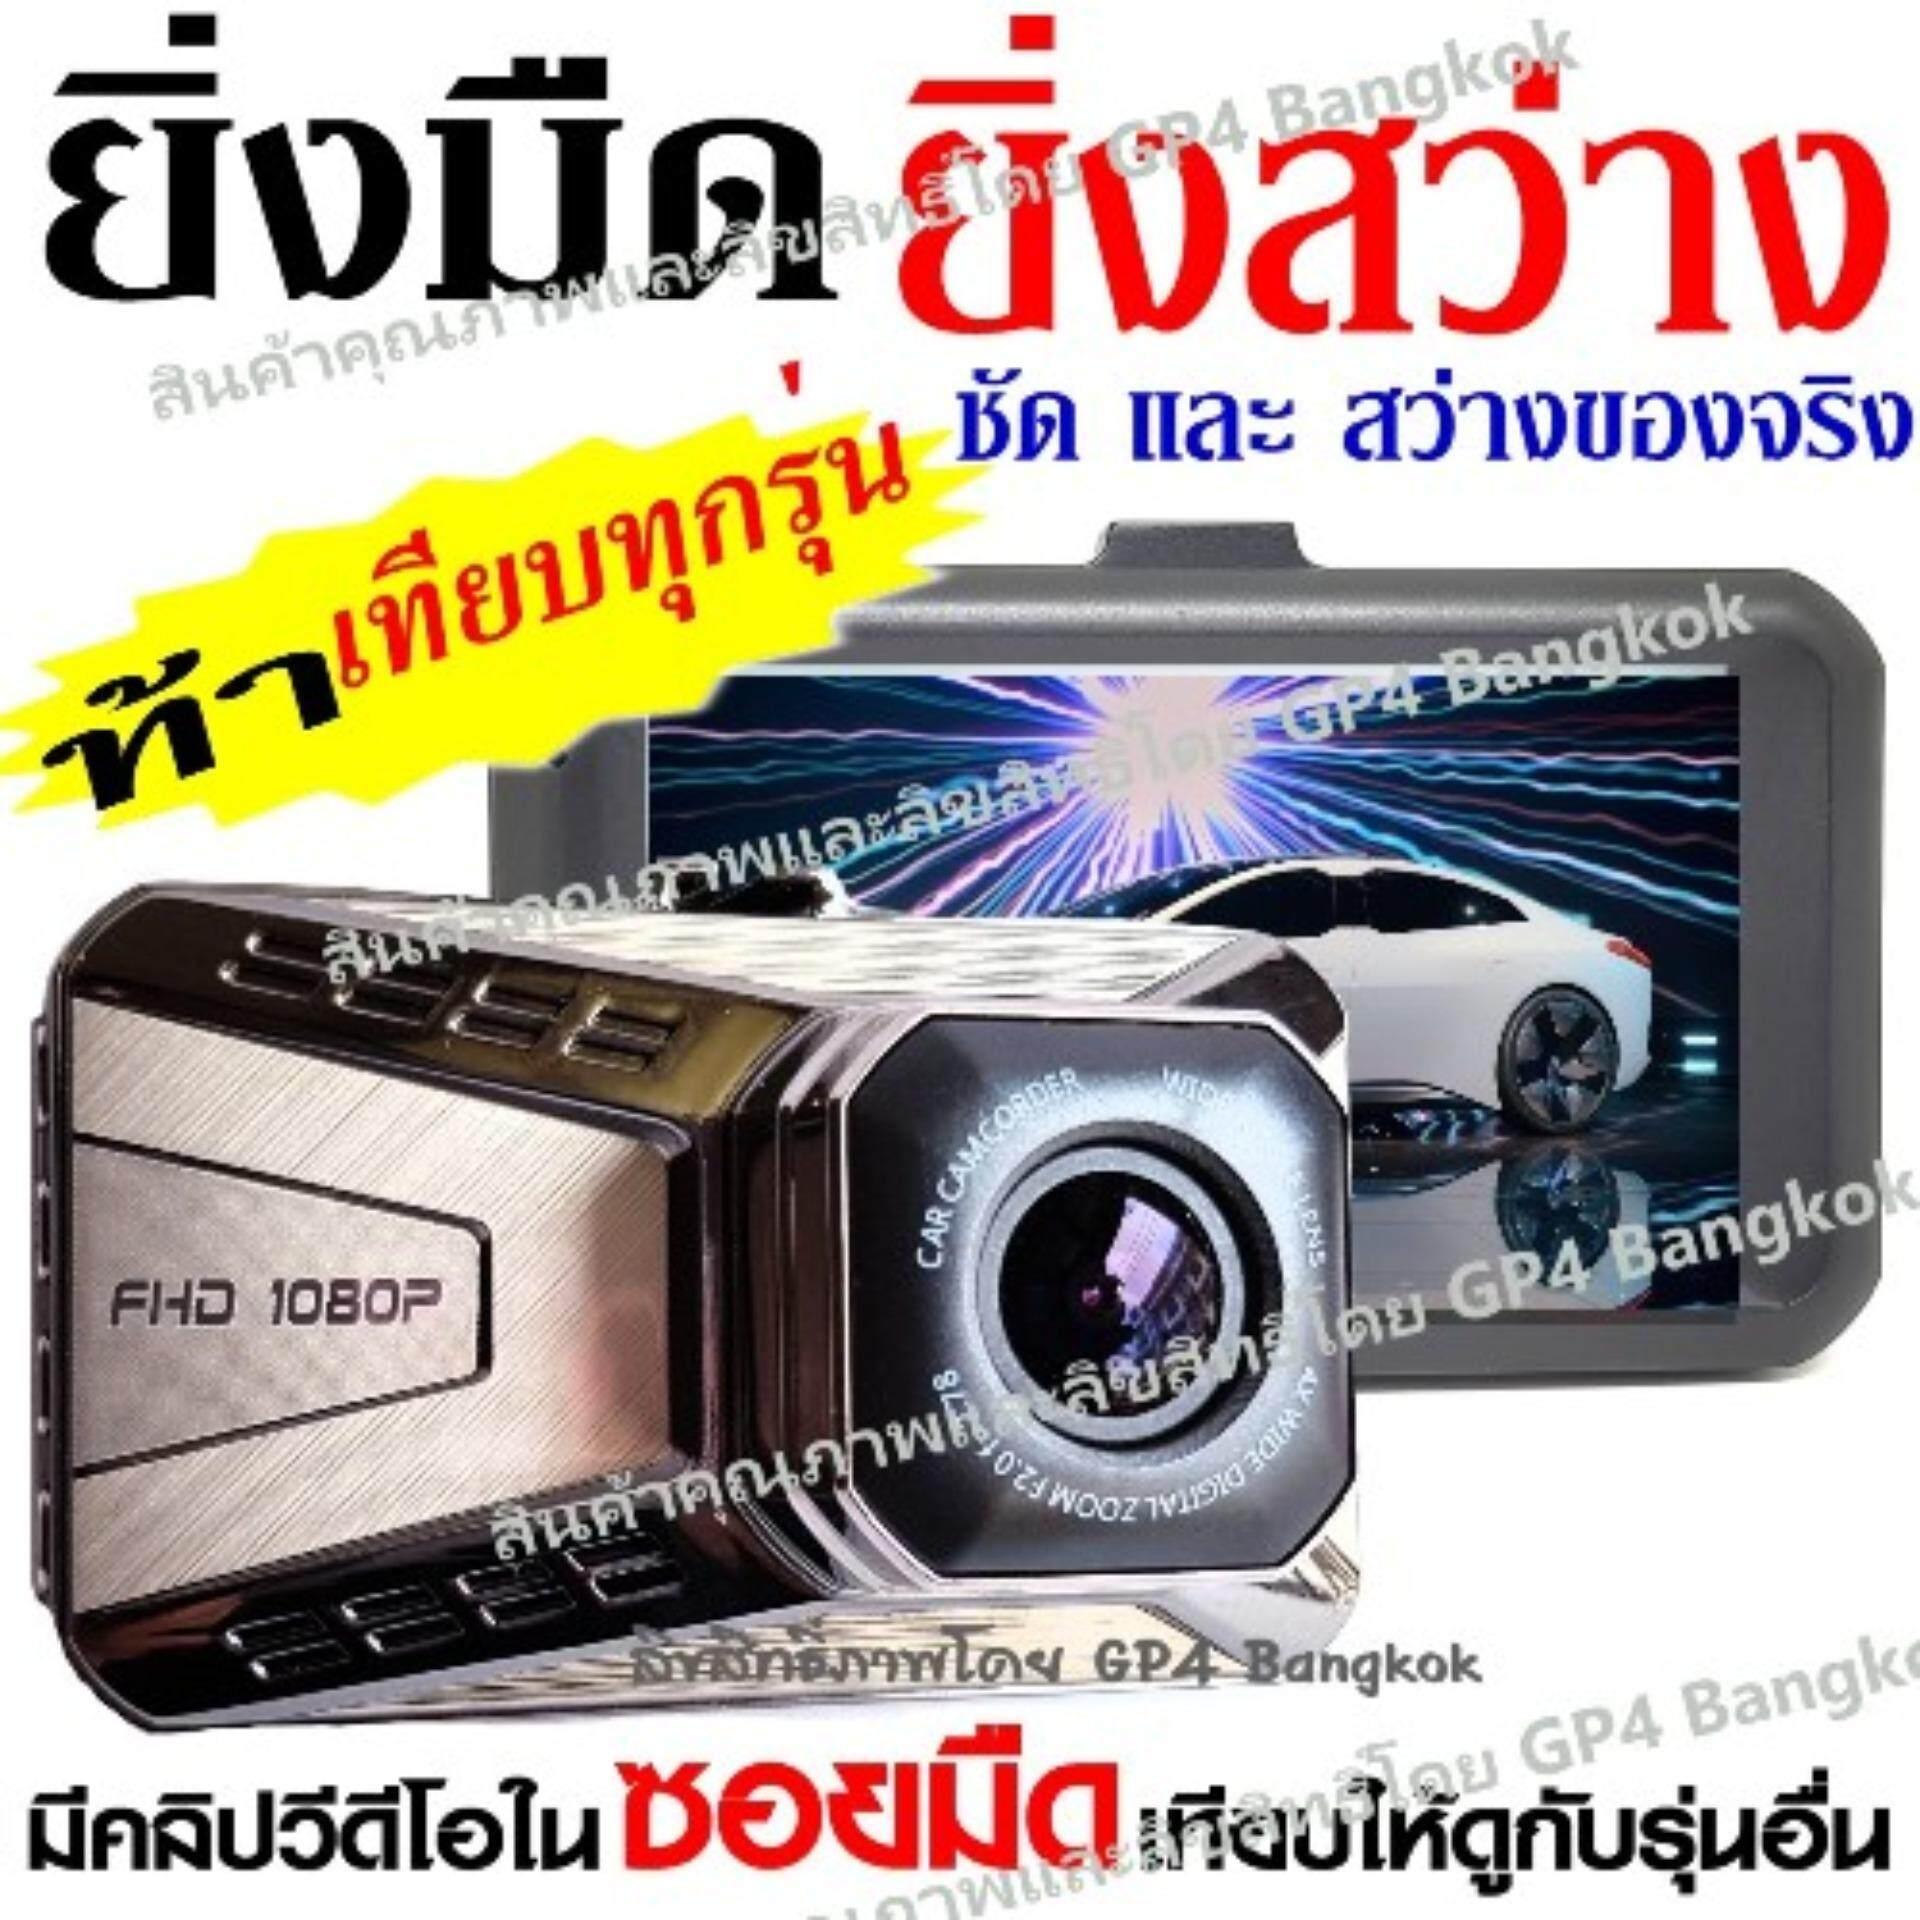 T990SE กล้องติดรถยนต์ กลางคืนสว่างที่สุด WDR + Super Night Vision + LDWS (เตือนออกนอกเลนส์) +FCWS (เตือนรถใกล้คันหน้าเกินไป) + Parking Monitor บอดี้โลหะ จอใหญ่ 3.0นิ้ว FHD 1080P เมนูไทย รุ่น T990SE (Silver)-มีคลิปวีดีโอในซอยมืดเปรียบเทียบกับรุ่นอื่นให้ดู